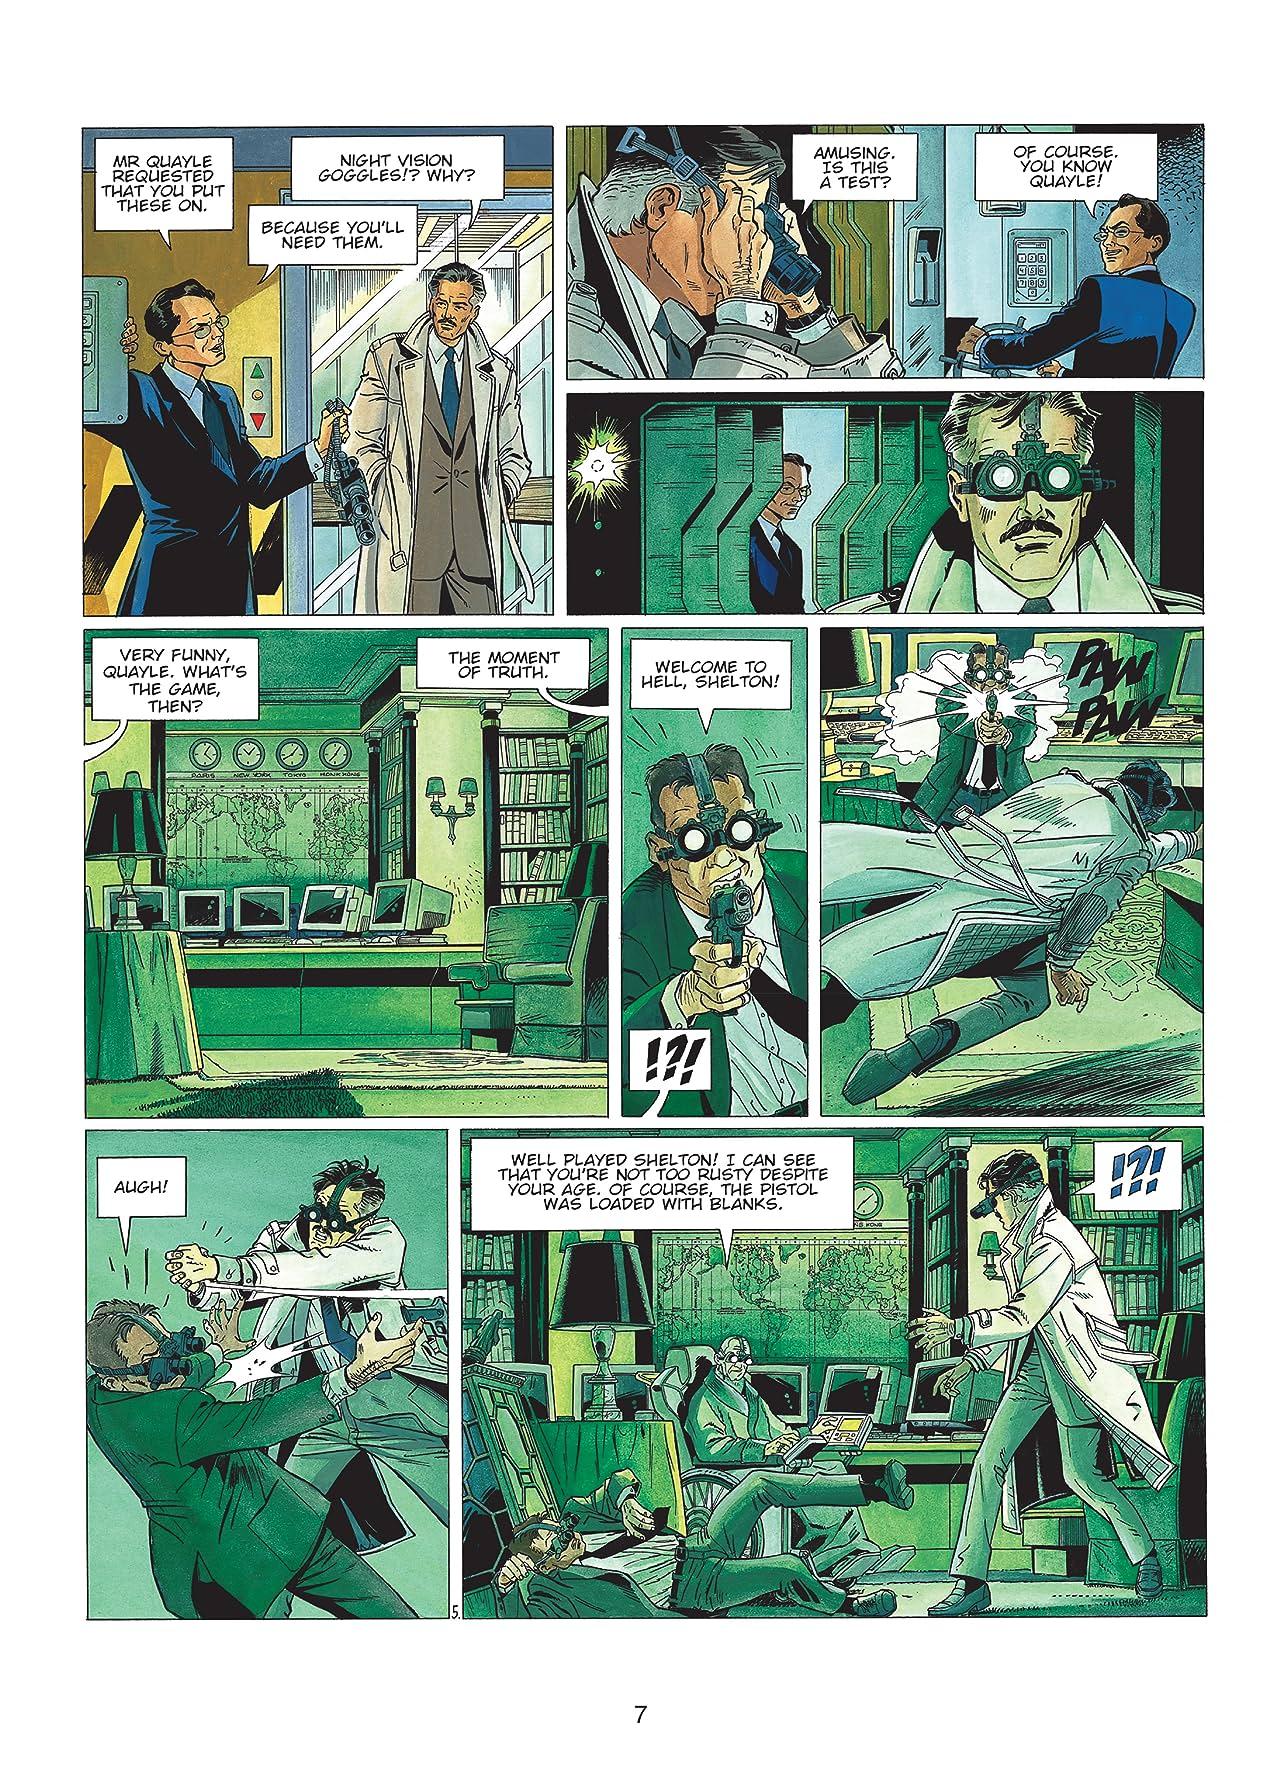 Wayne Shelton Vol. 1: The Mission